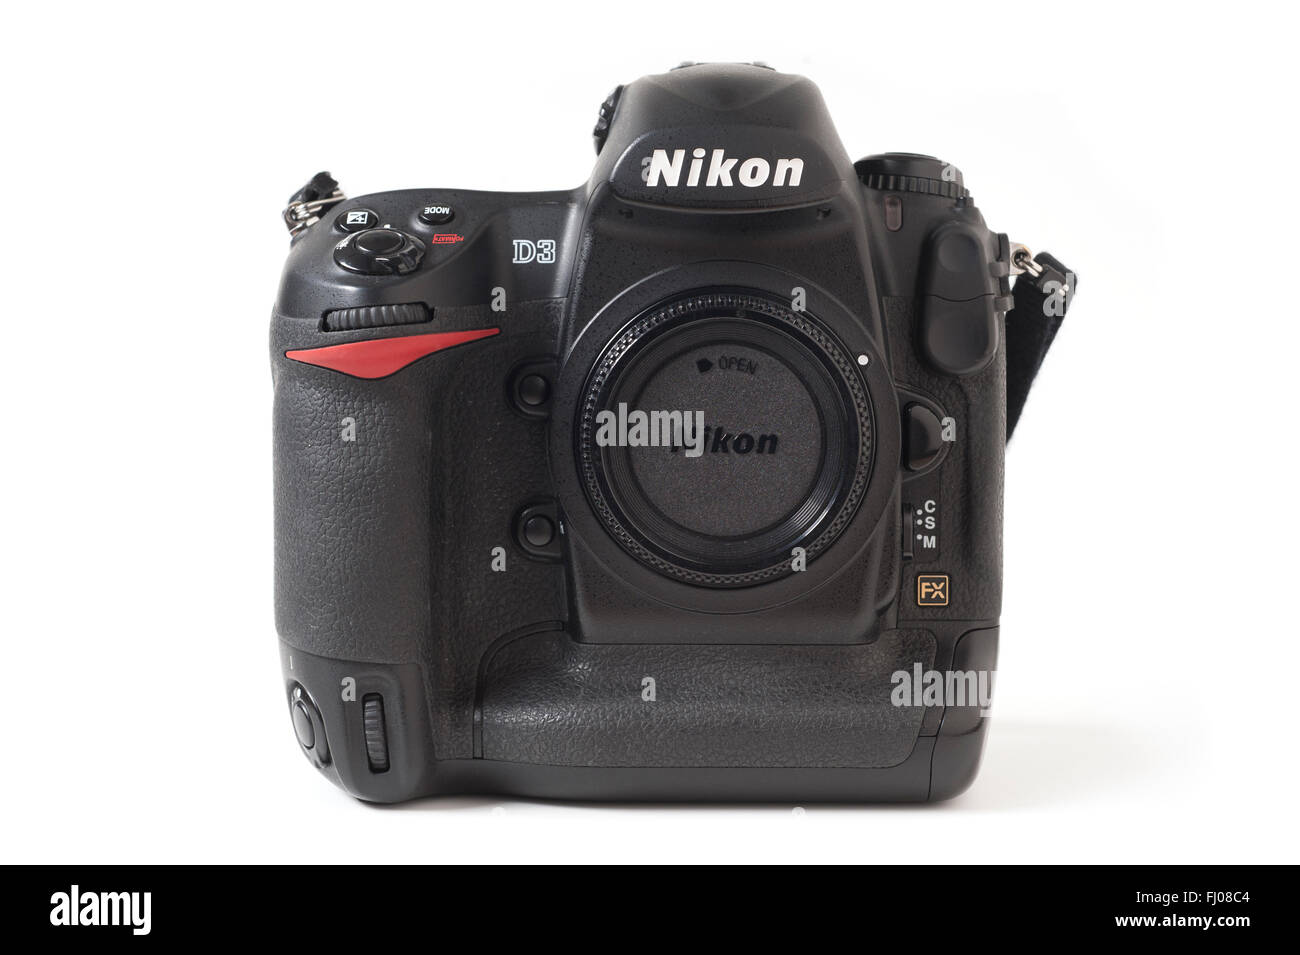 nikon d3 dslr camera body on white background nikon s flagship